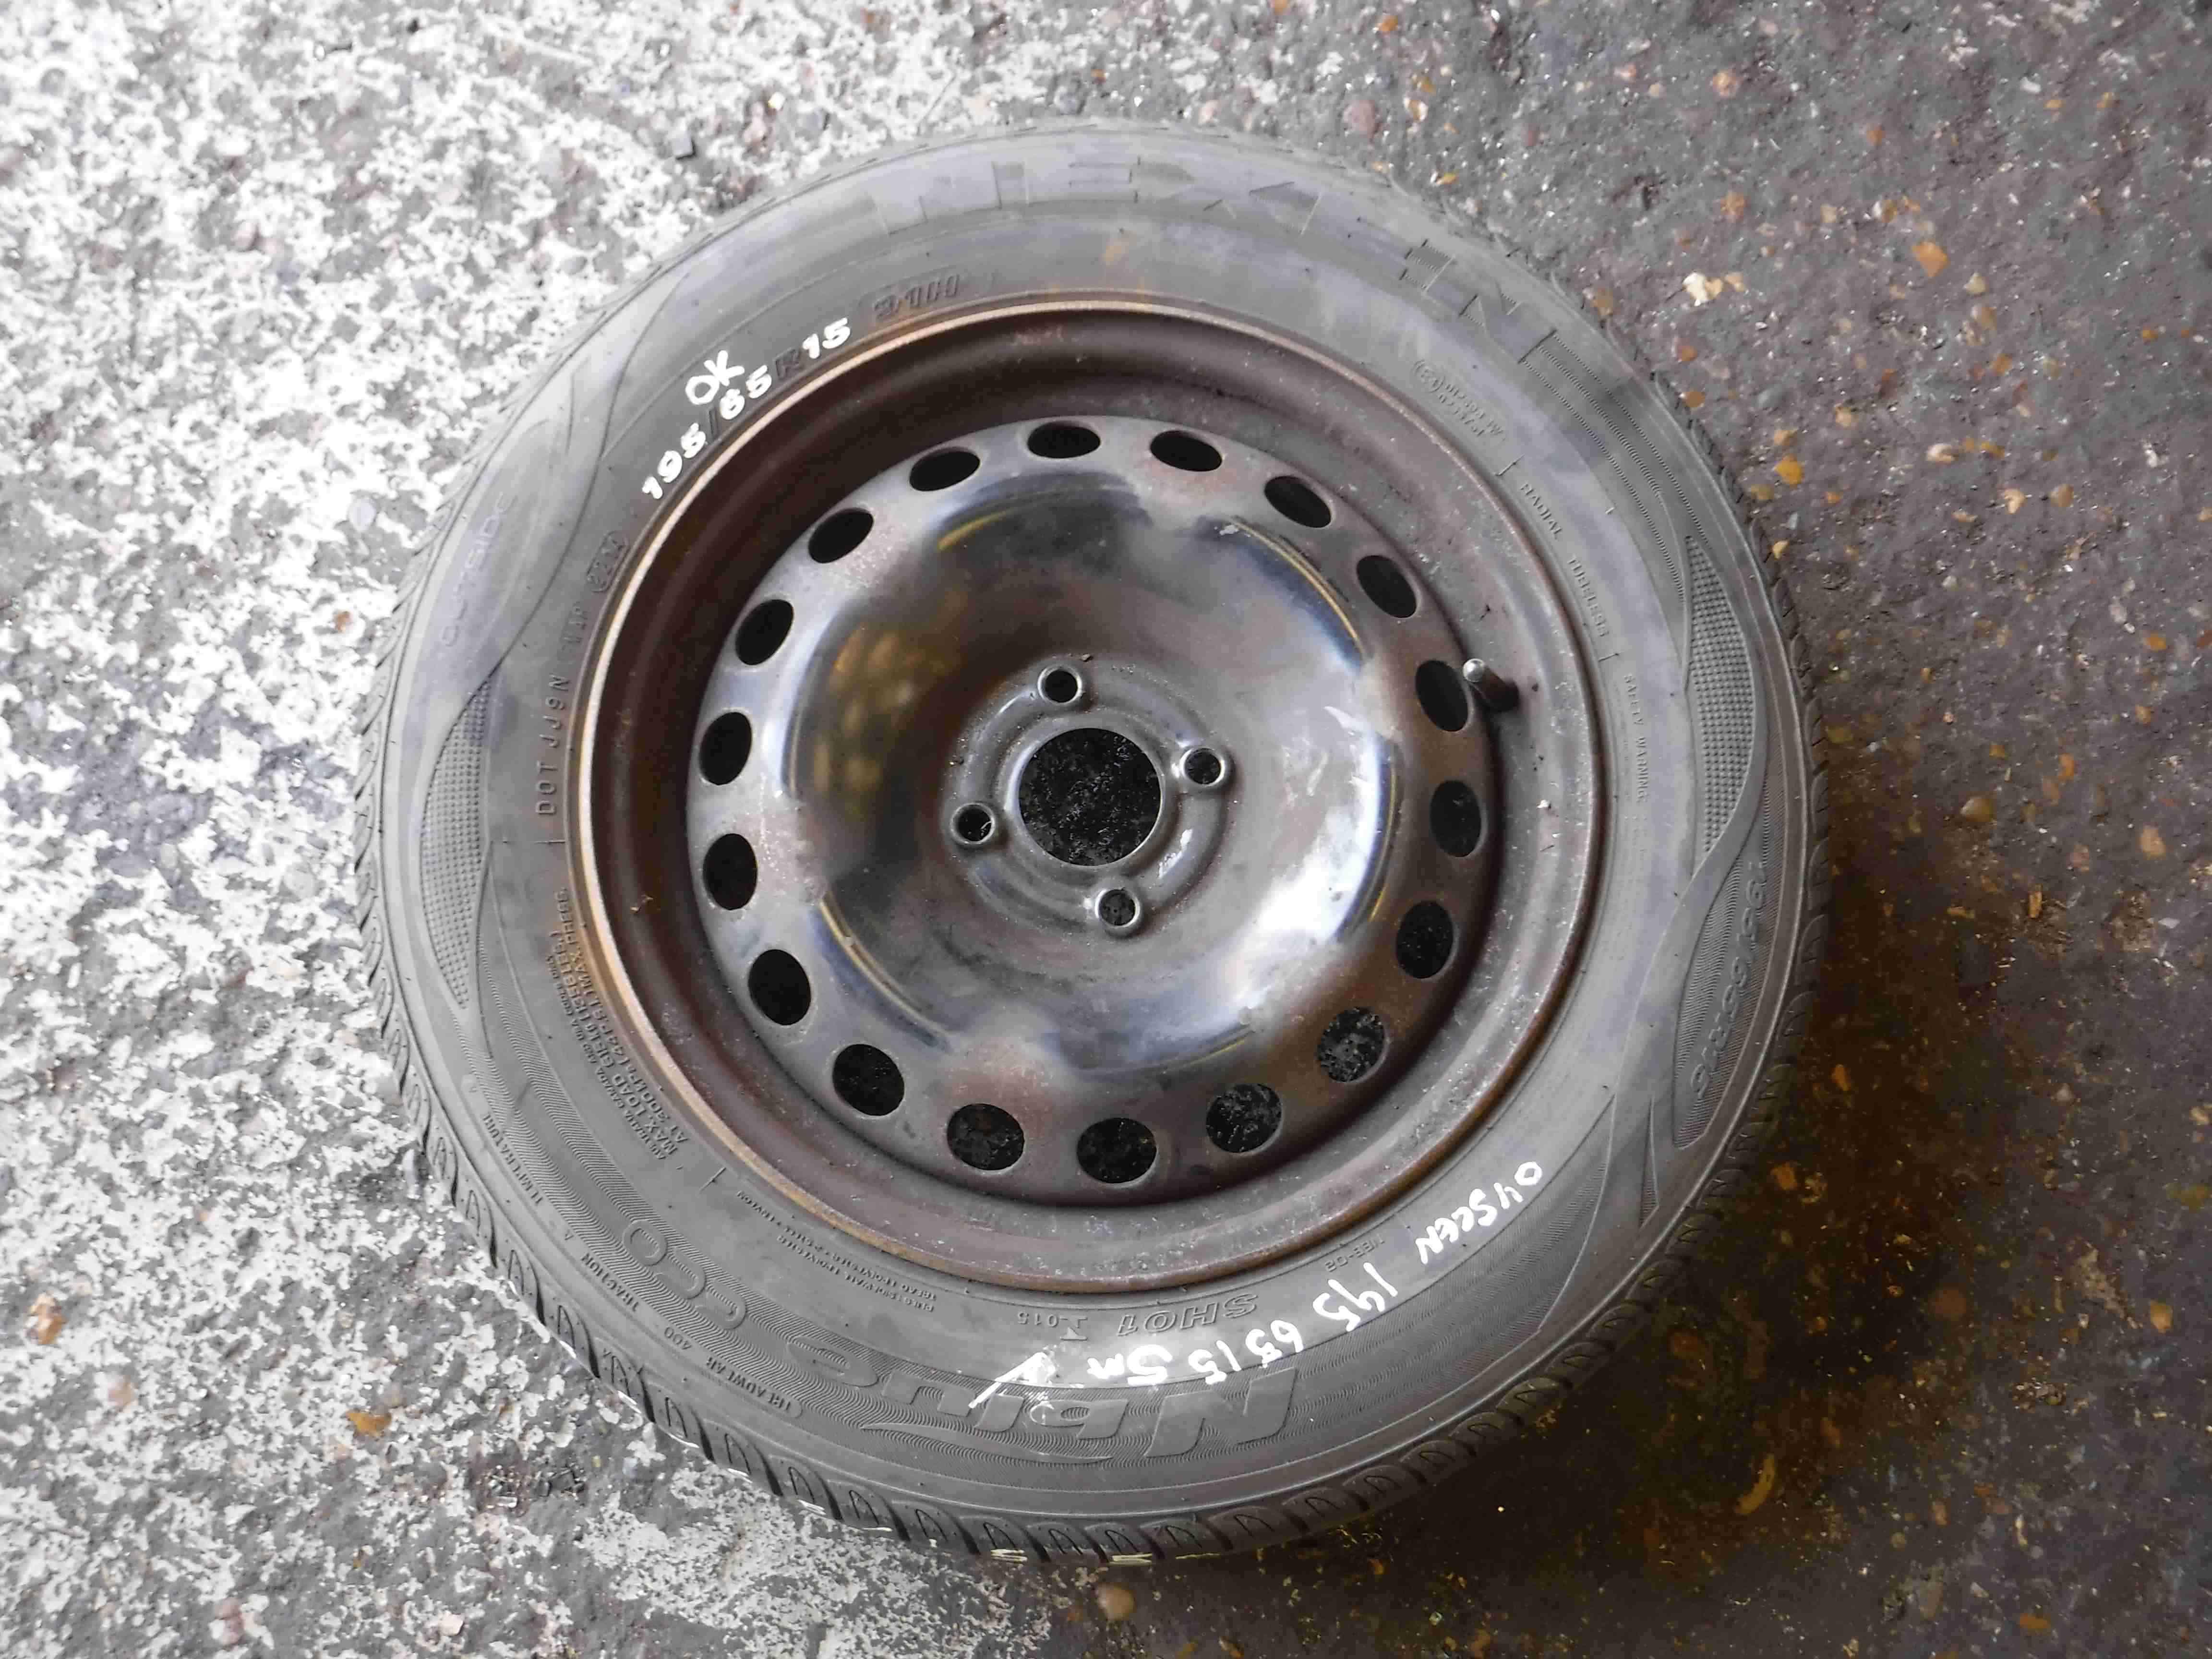 Renault Scenic 2003-2009 Steel Wheel Rim + Tyre 195 65 15 5mm Tread